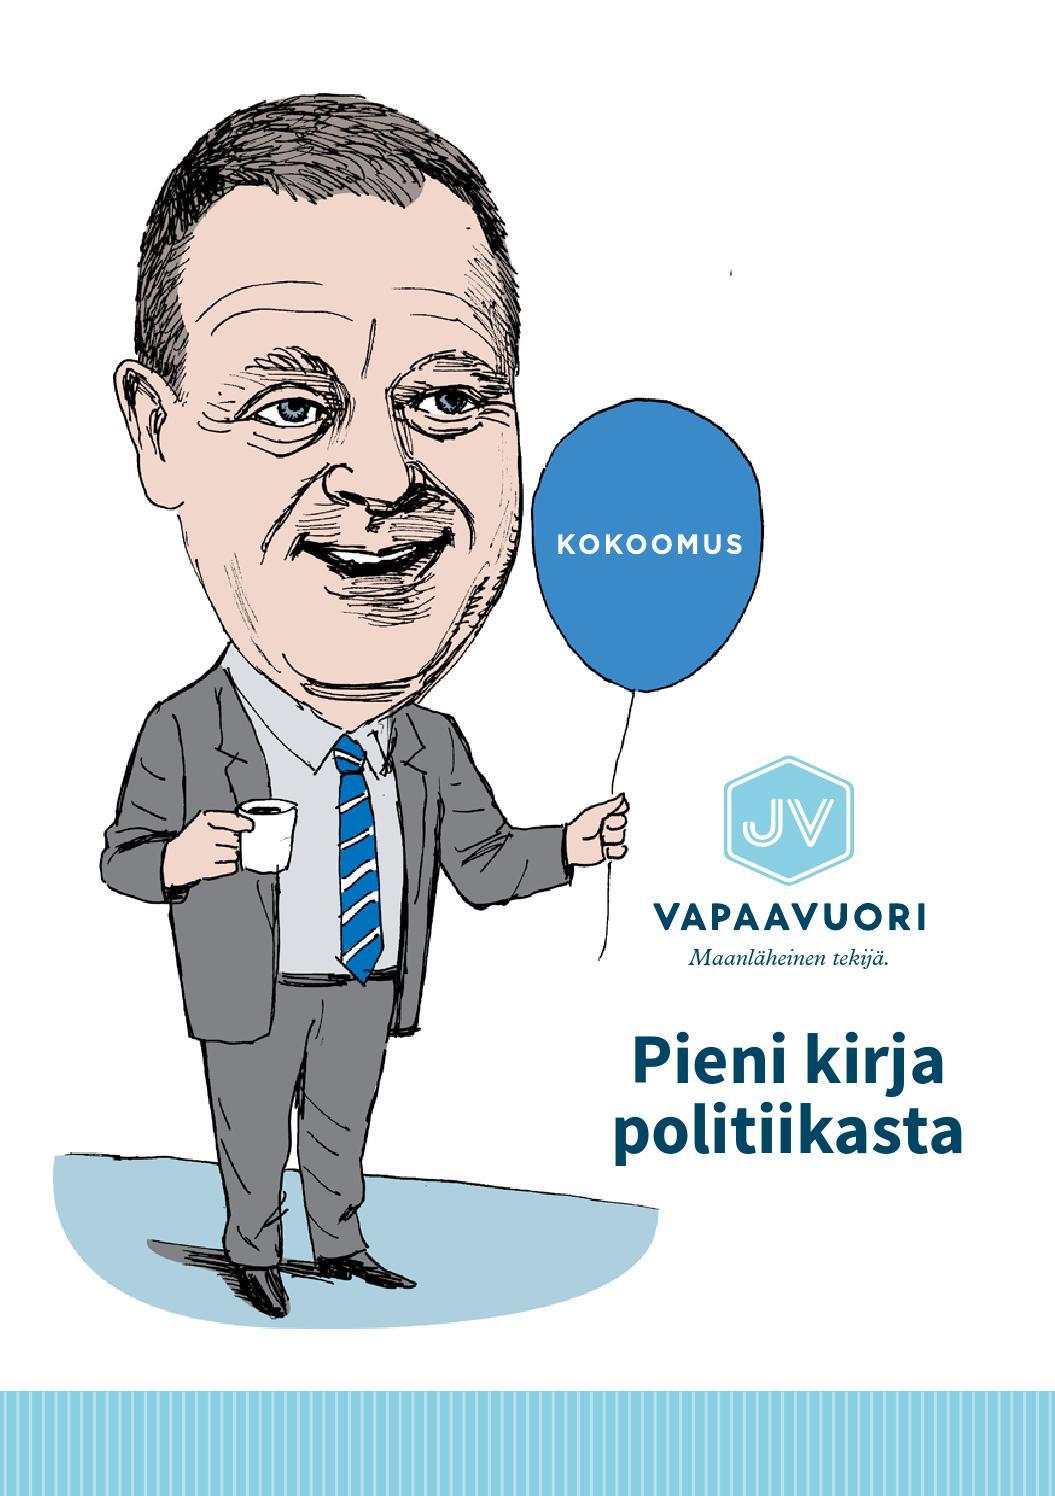 Pieni kirja politiikasta by Vapaavuori  issuu